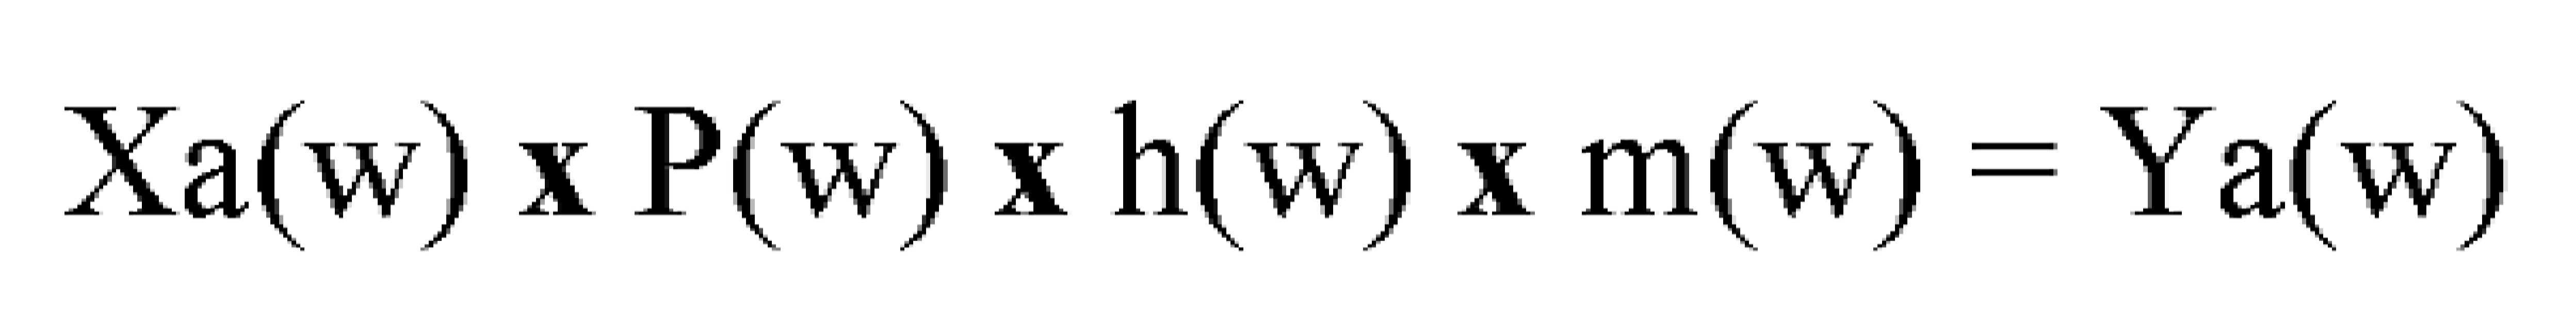 Figure 112018103574744-pct00001